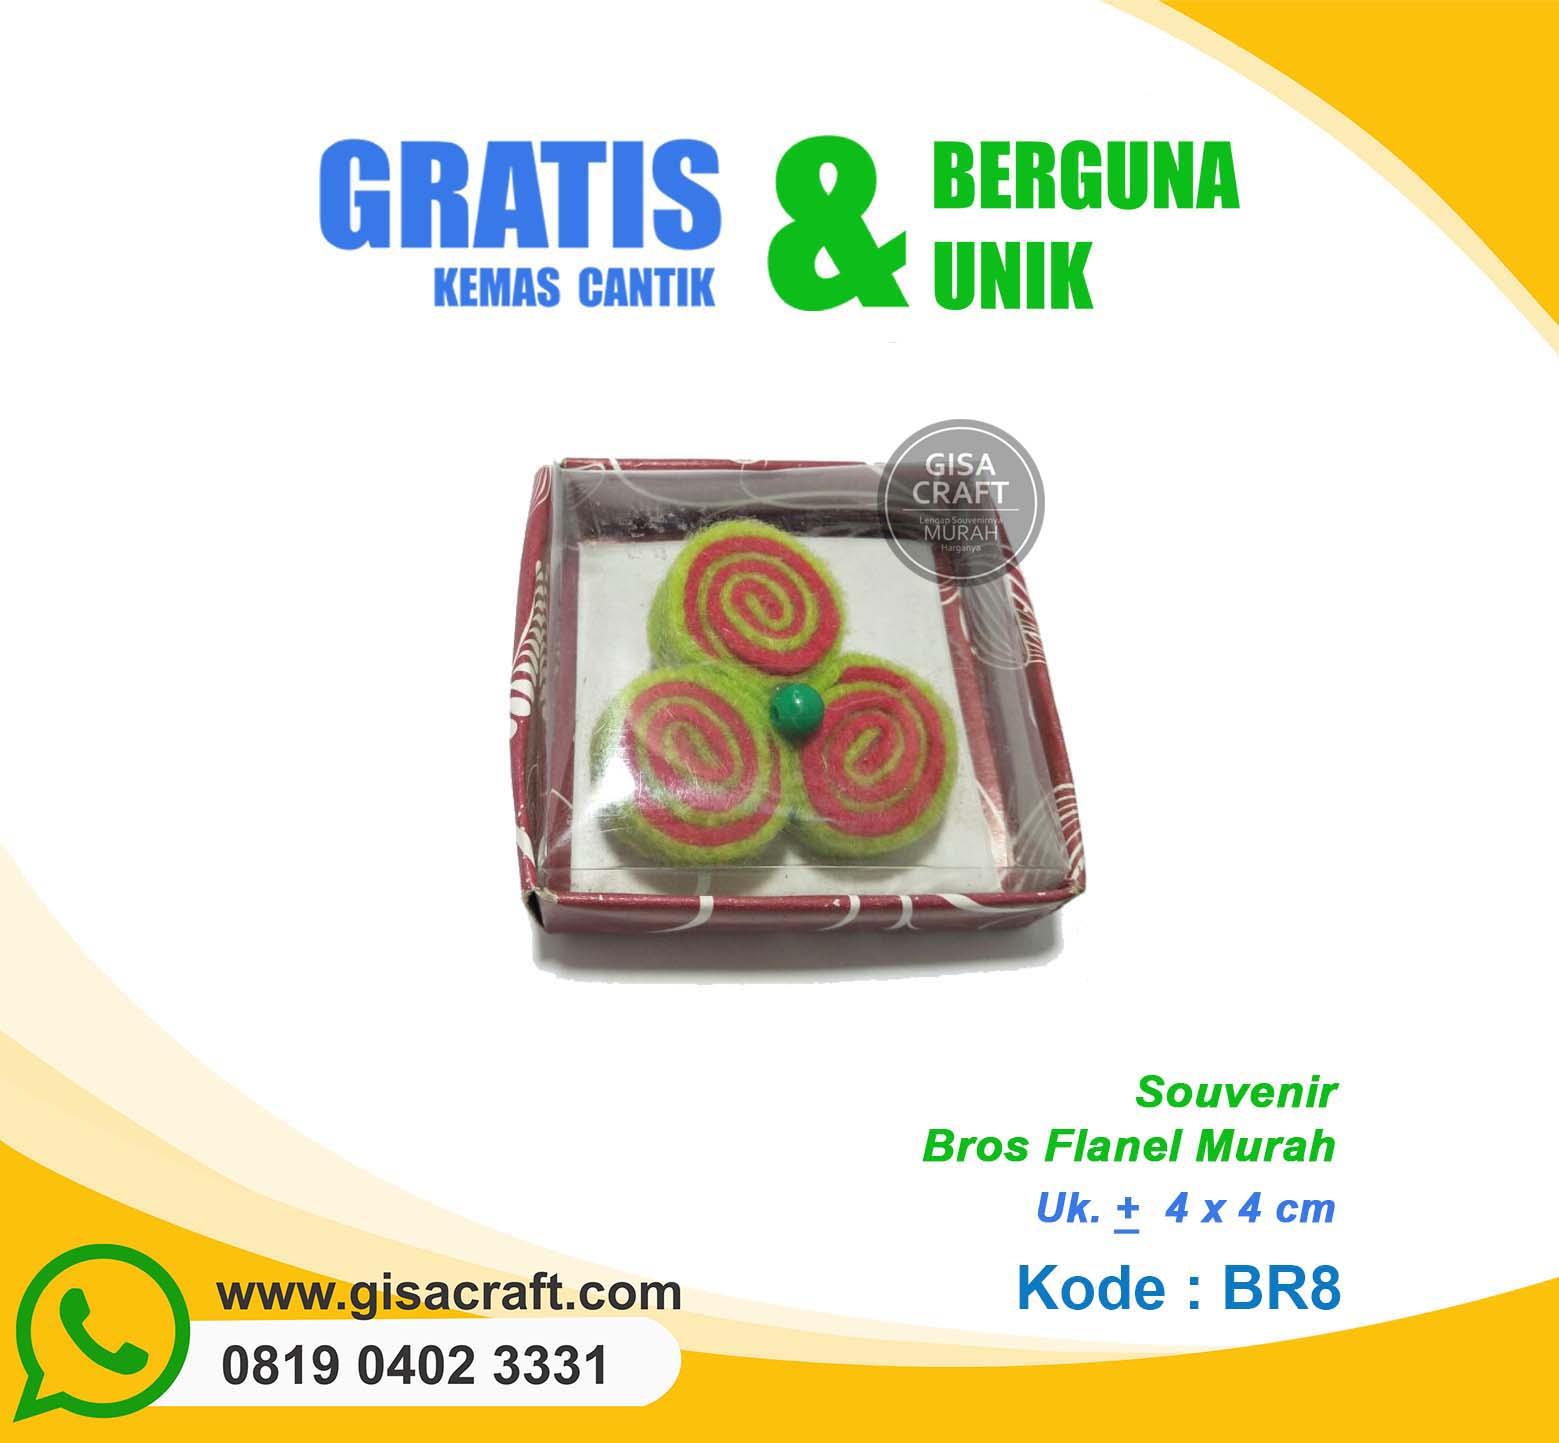 Souvenir Bros Flanel Murah BR8